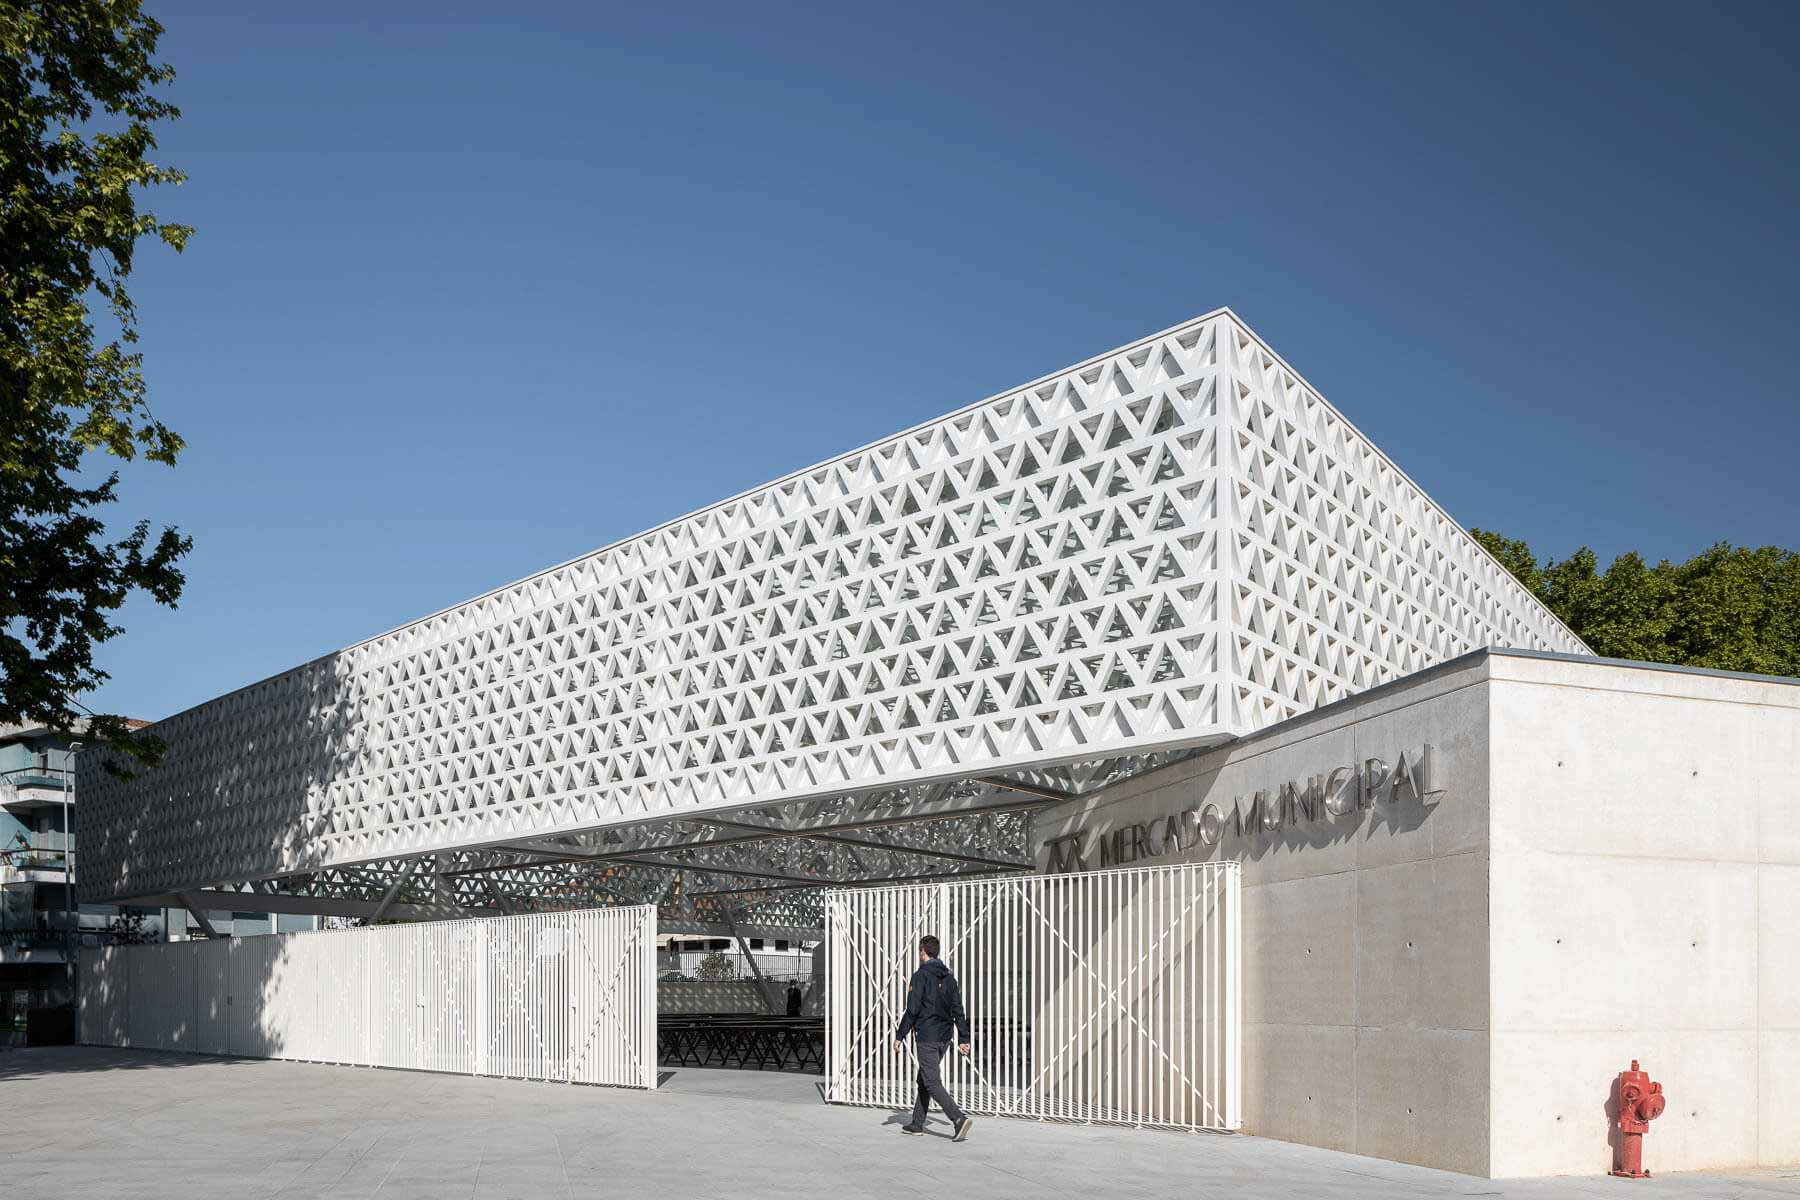 Проект восстановления муниципального рынка Вила-Нова-де-Фамаликан / Rui Mendes Ribeiro + Unidade de Projeto Urbano do Município de Vila Nova de Famalicao